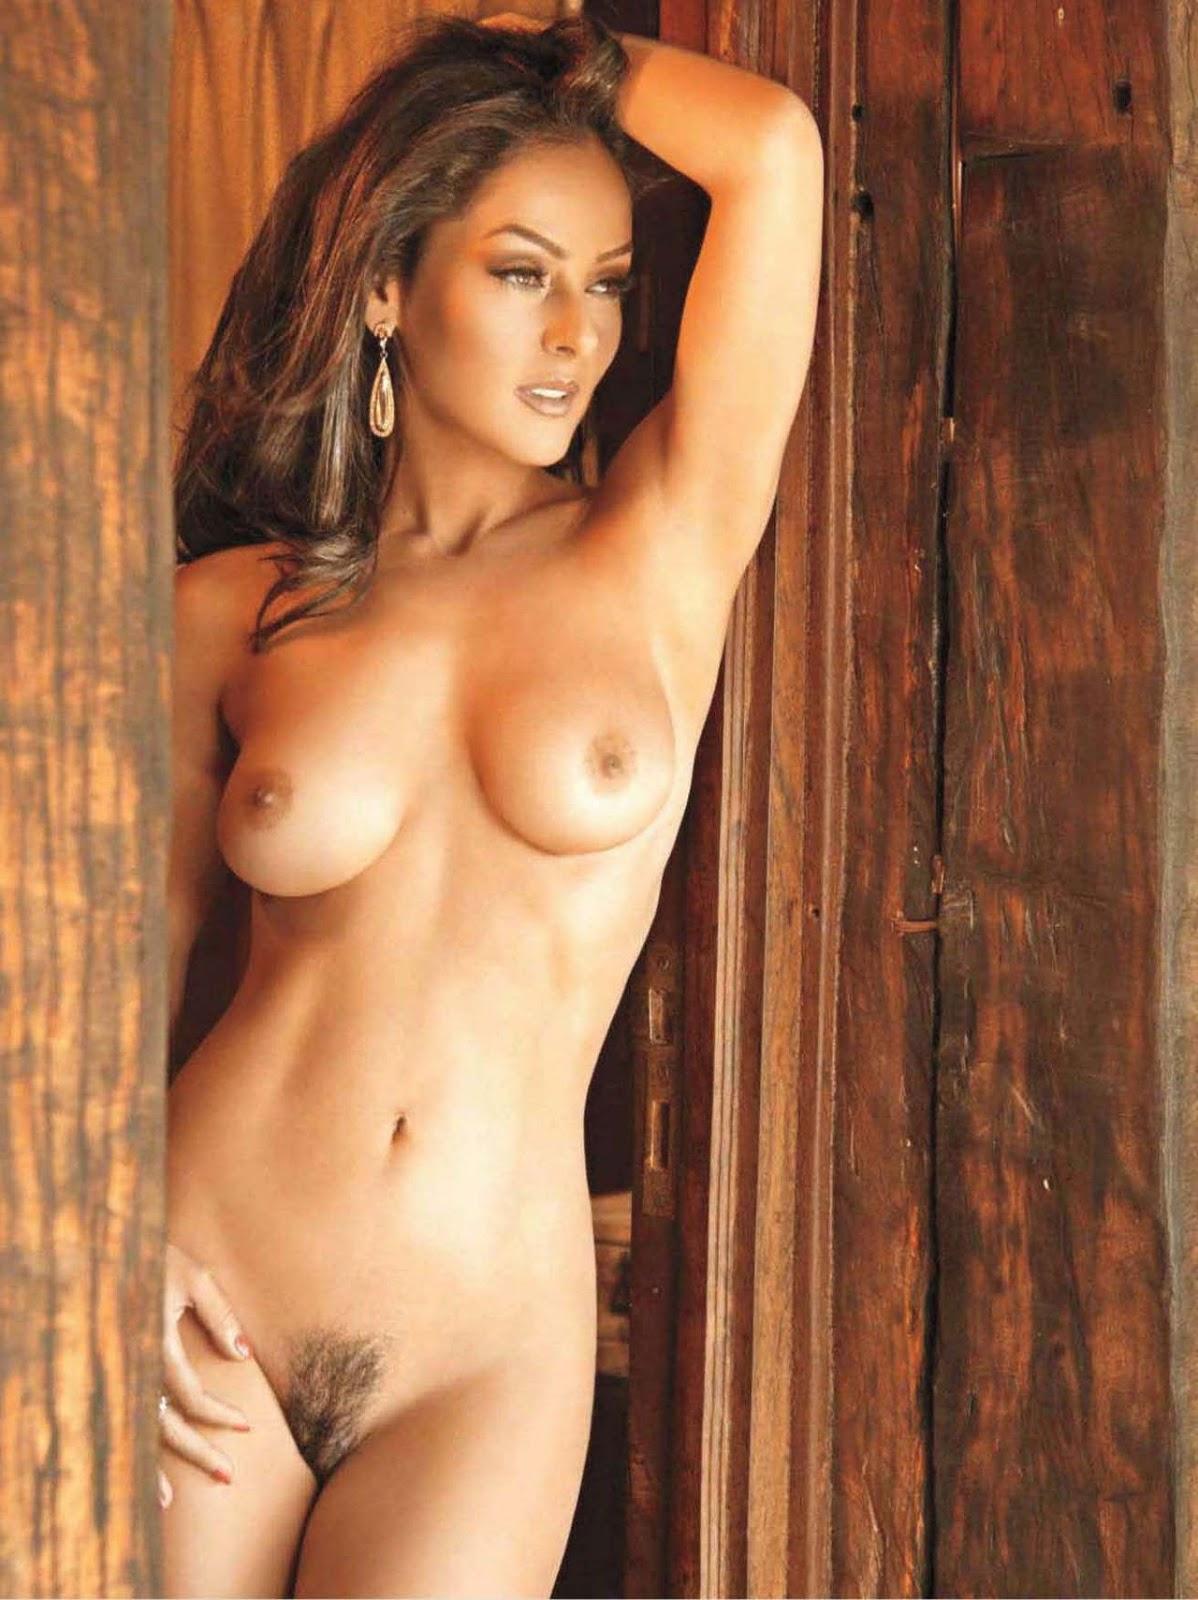 Beautiful mexican women nude having sex